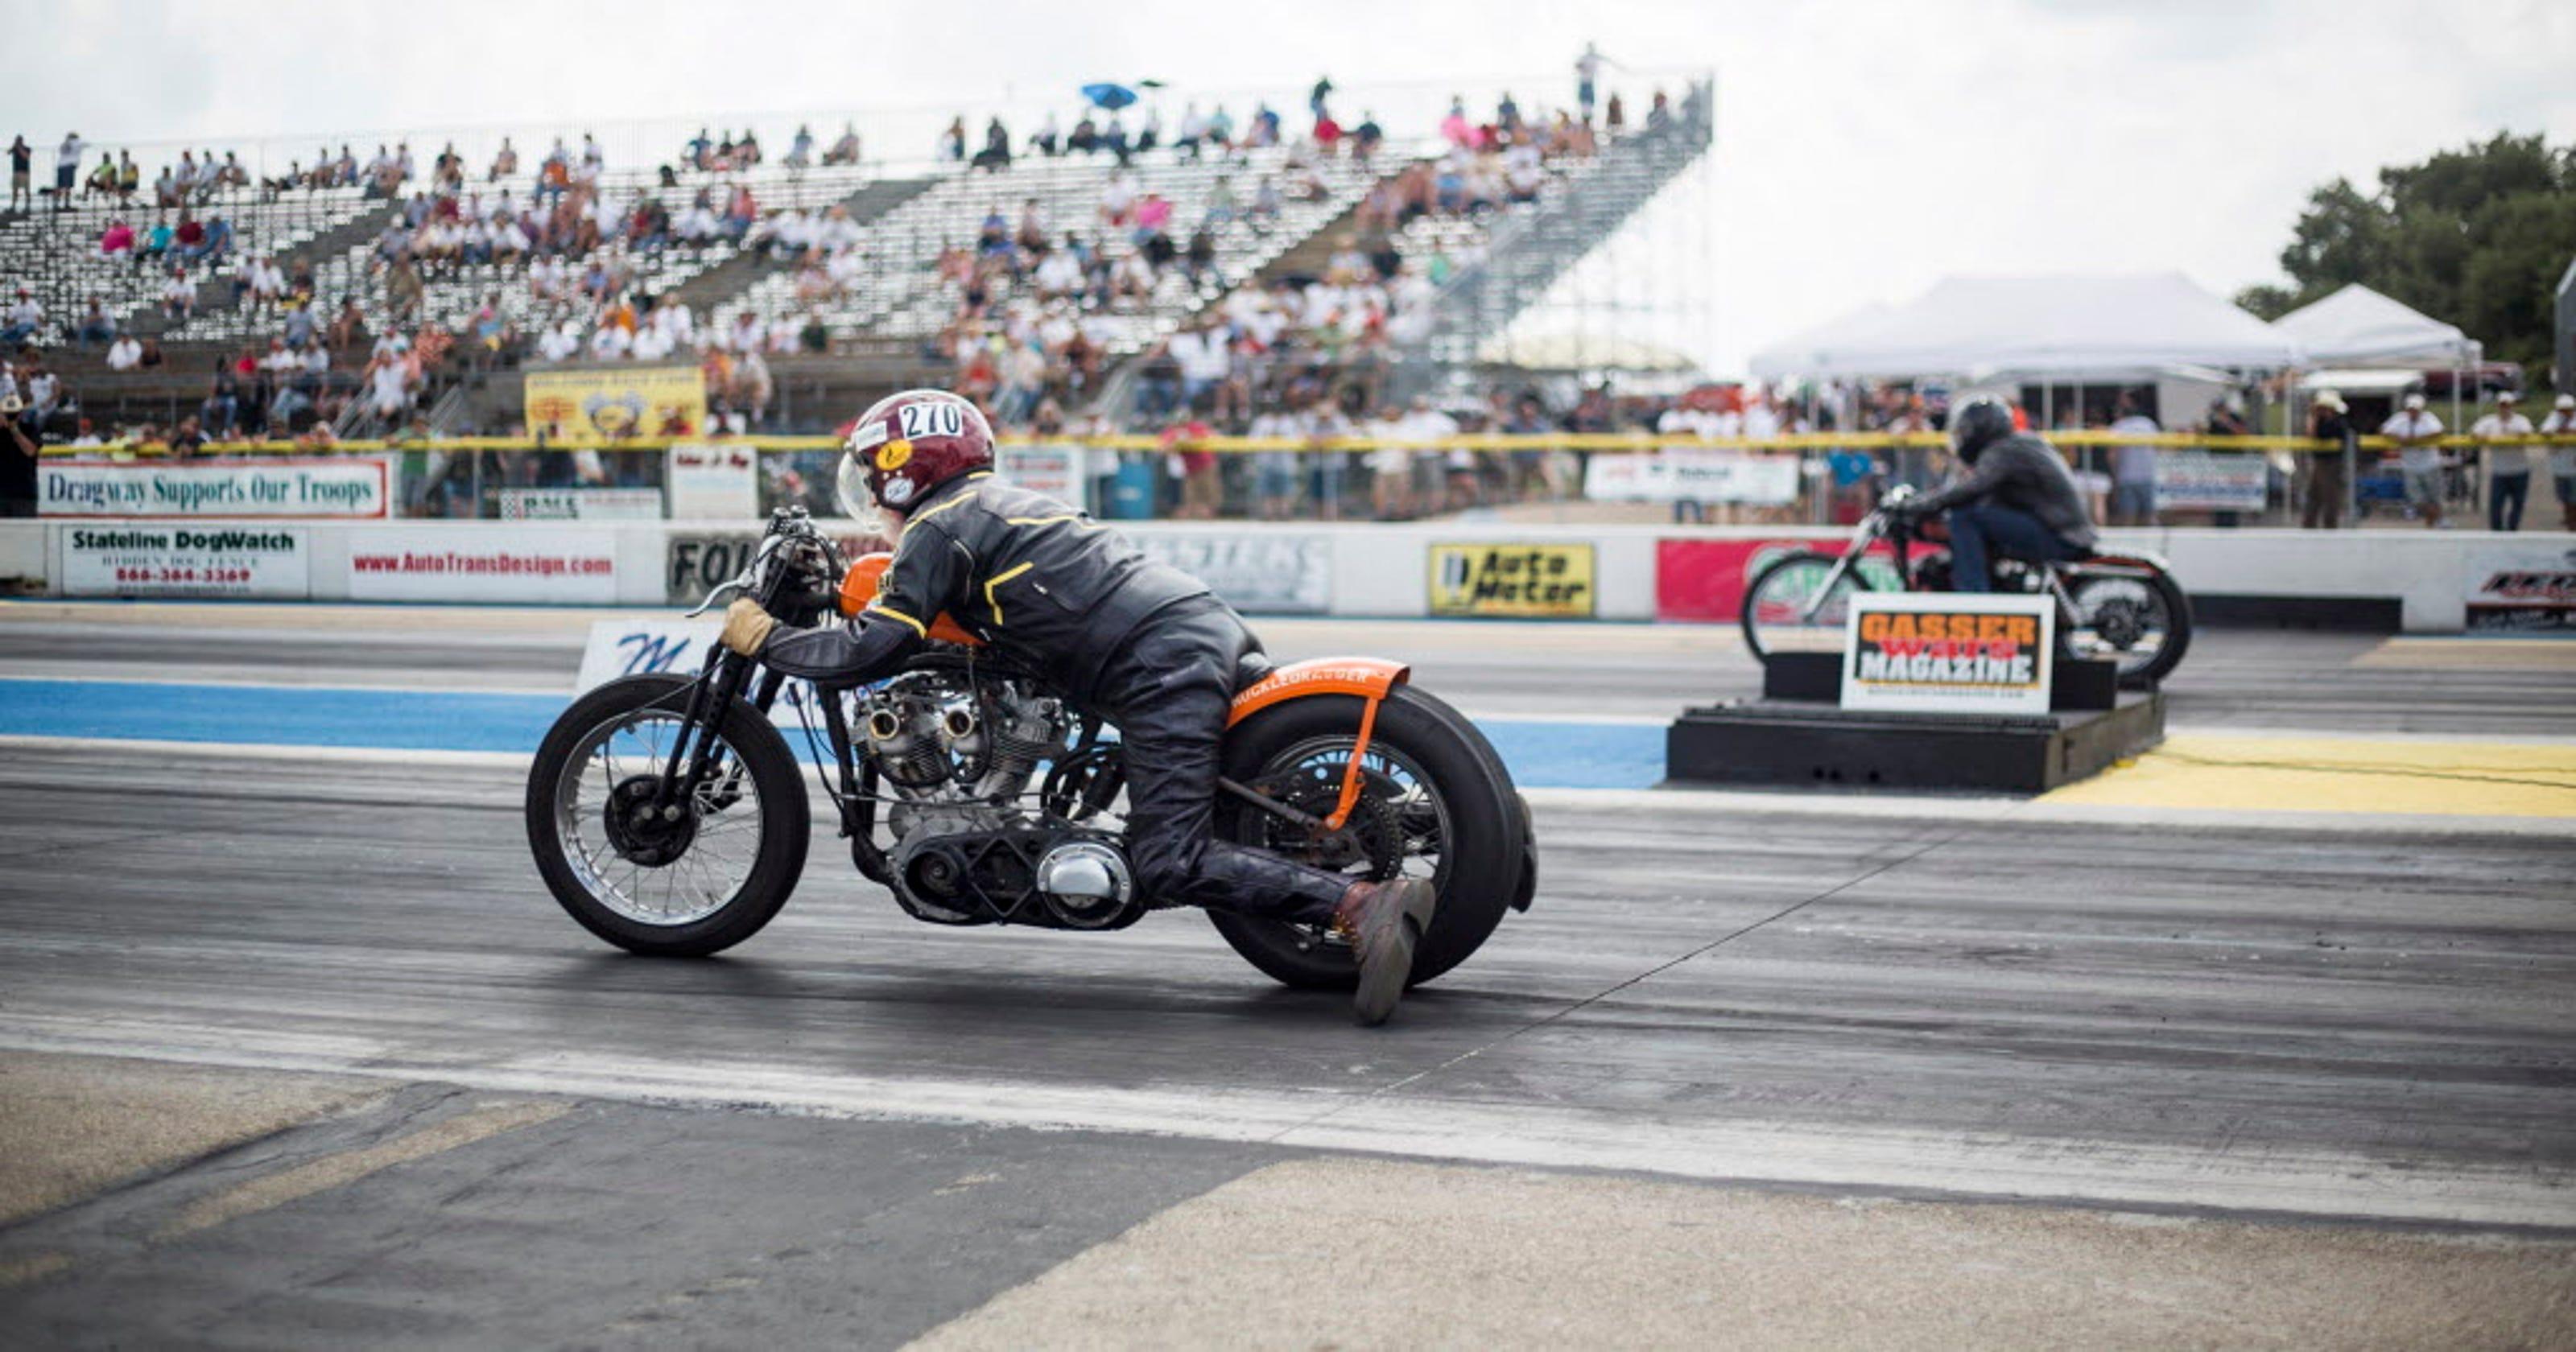 Harley Davidson Dealers In Wisconsin Map.Harley Davidson 115th Anniversary In Milwaukee Bikes Over Music